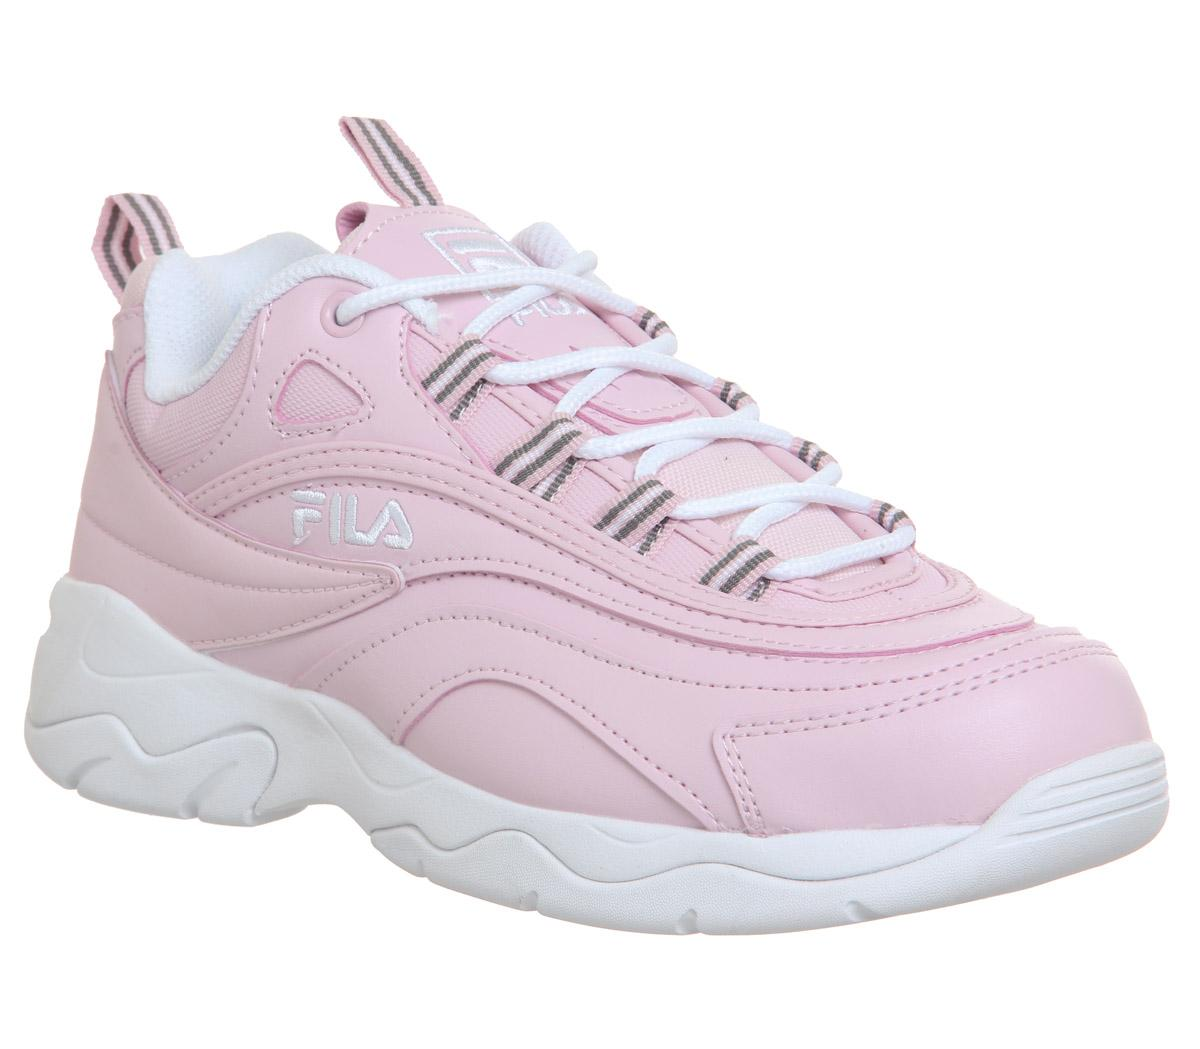 Fila Fila Ray Trainers Chalk Pink White